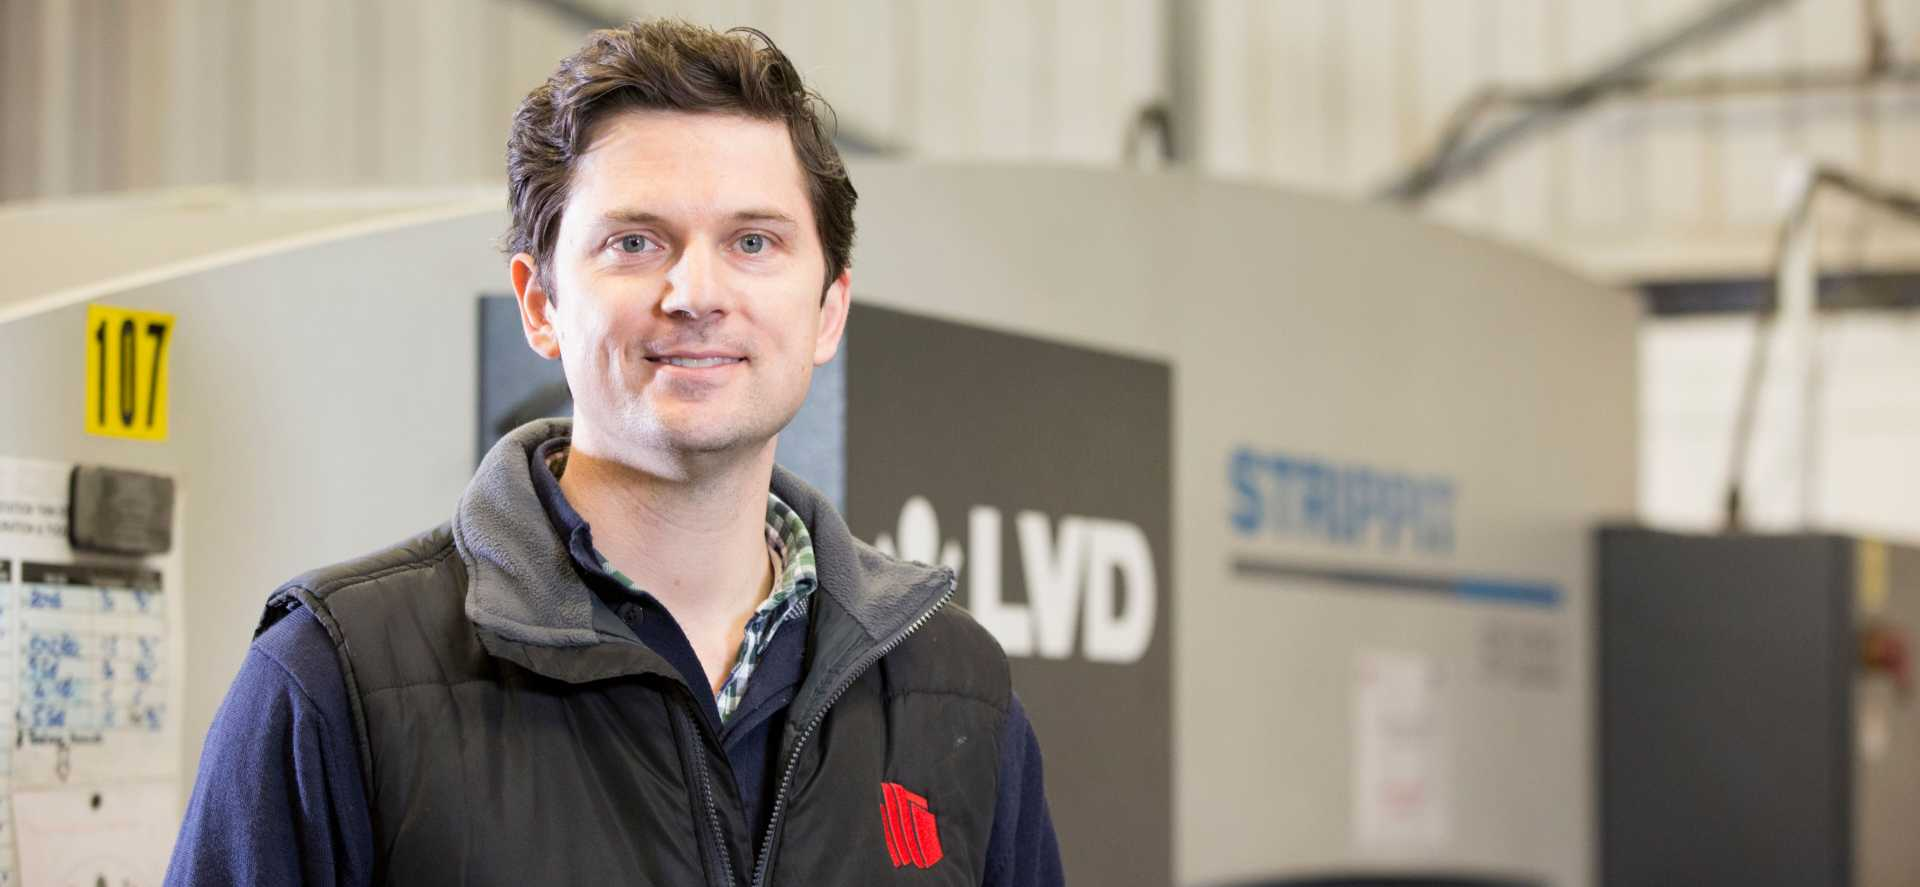 Troy Barratt CEO Contracts Engineering - Locate in Kent